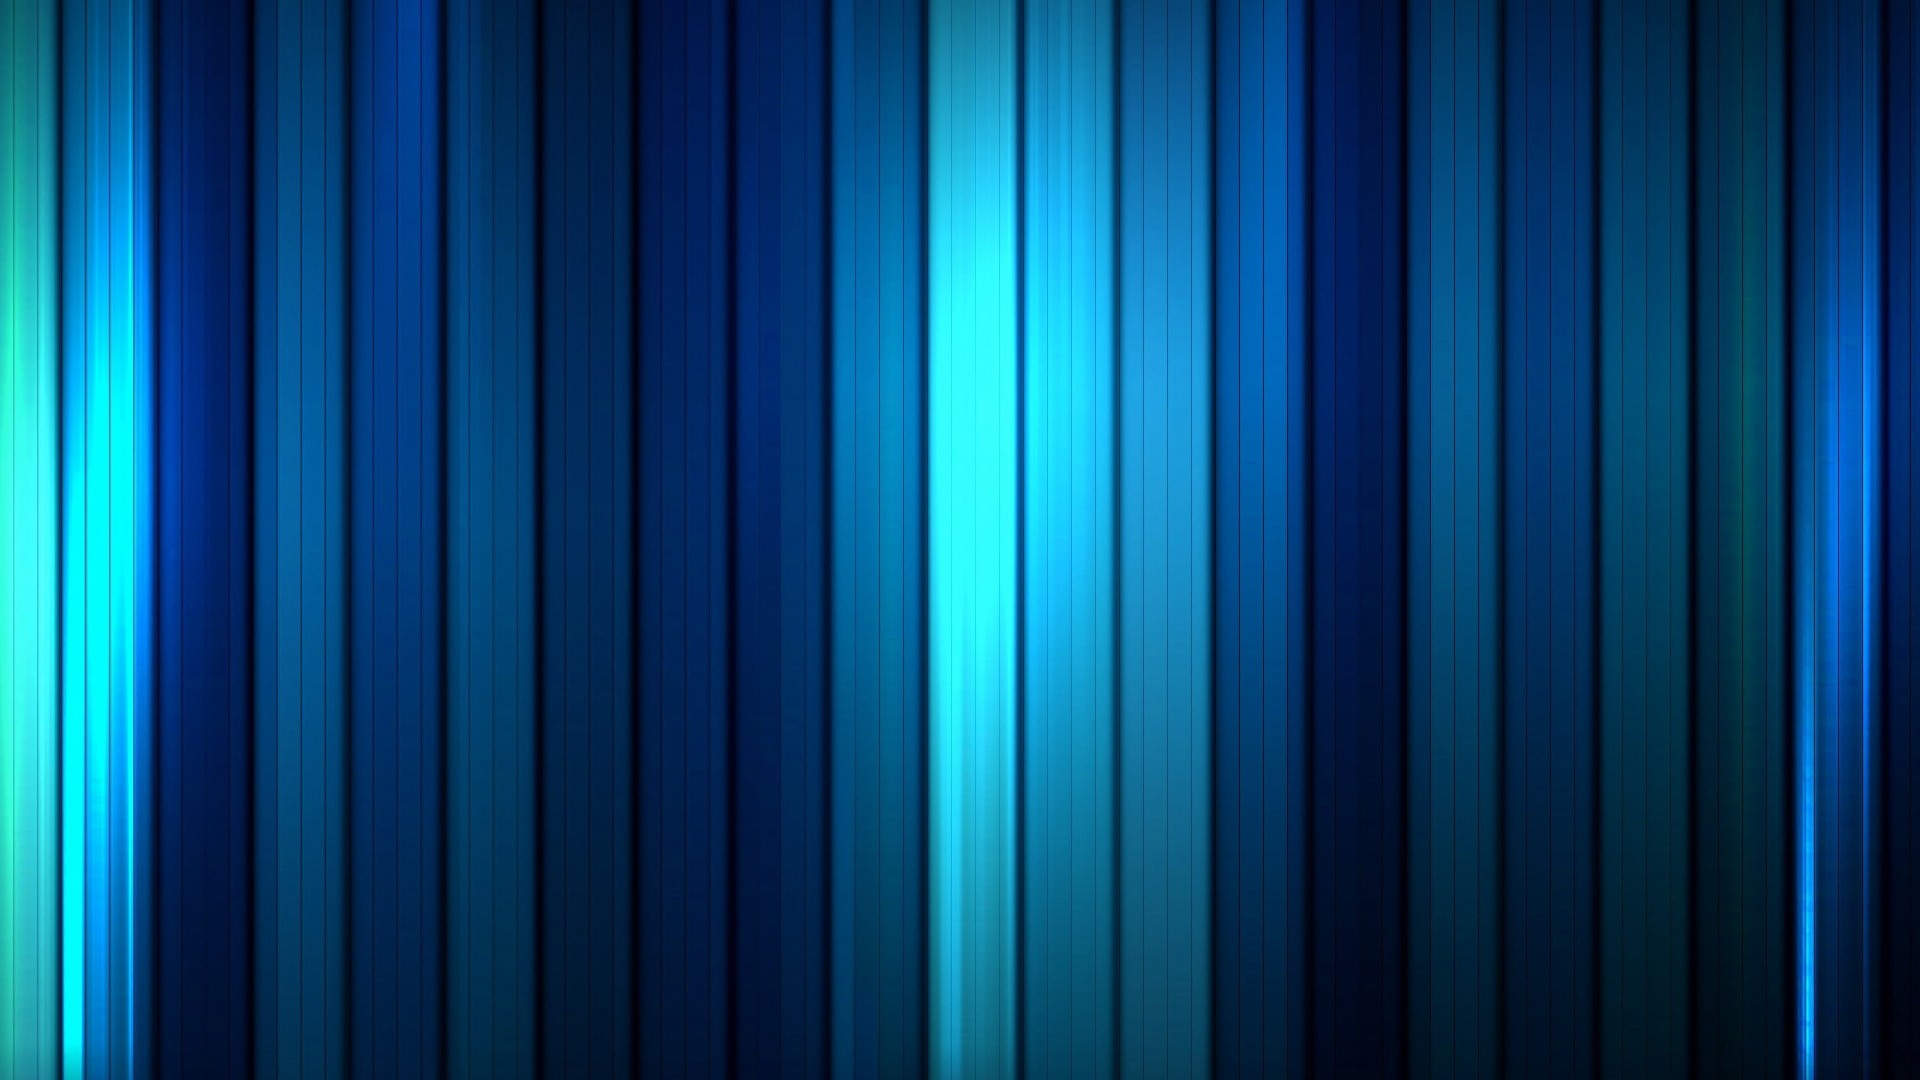 Dark Blue Free Wallpaper